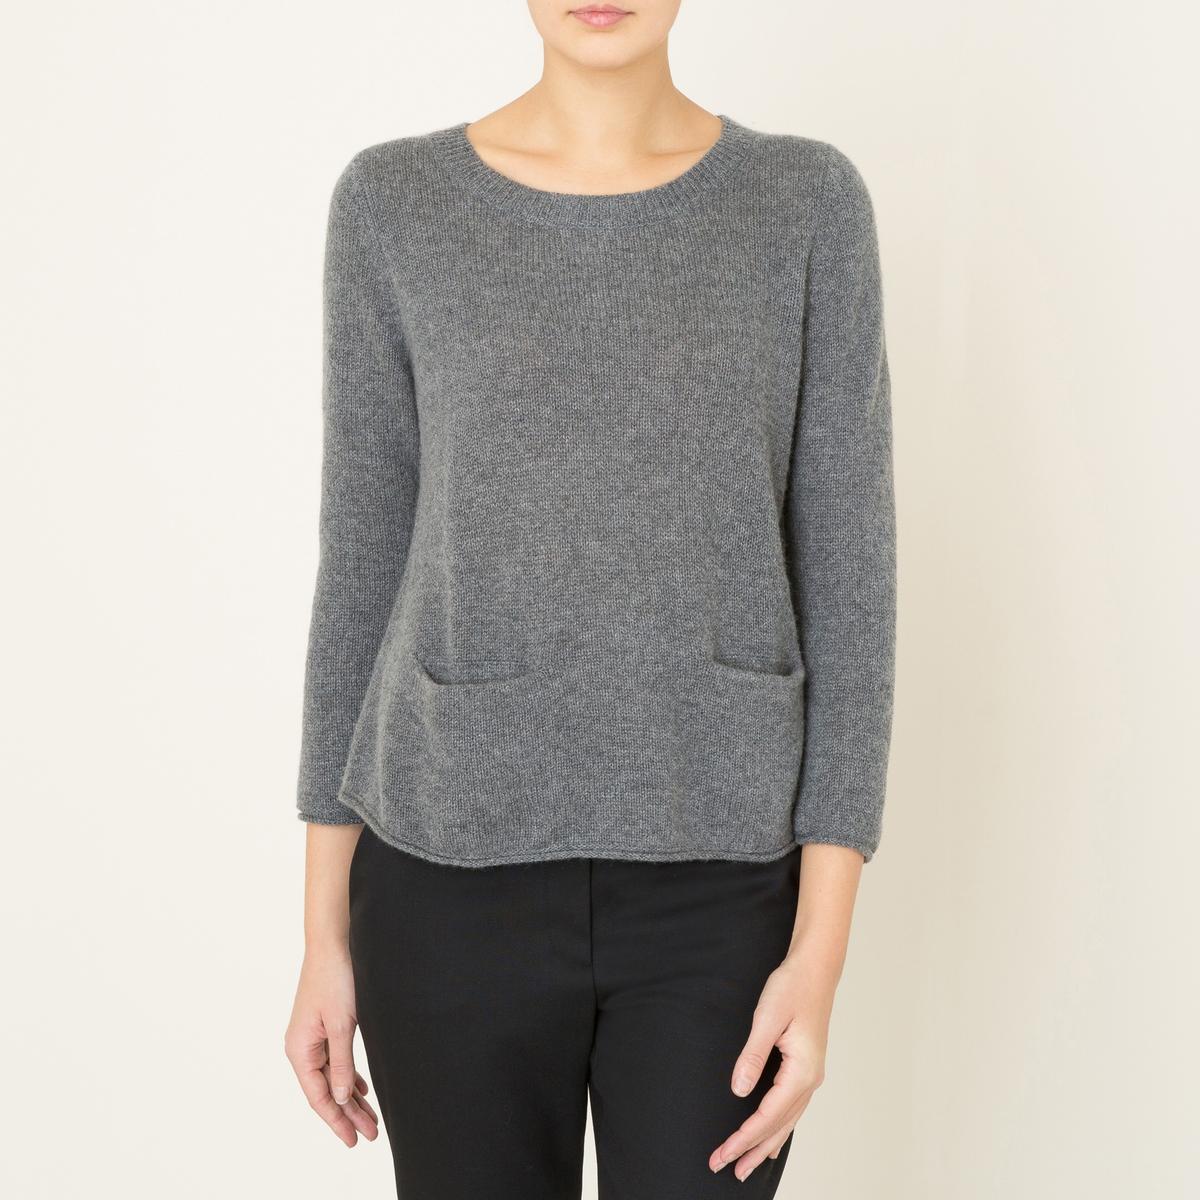 Пуловер INNOCENT от La Redoute